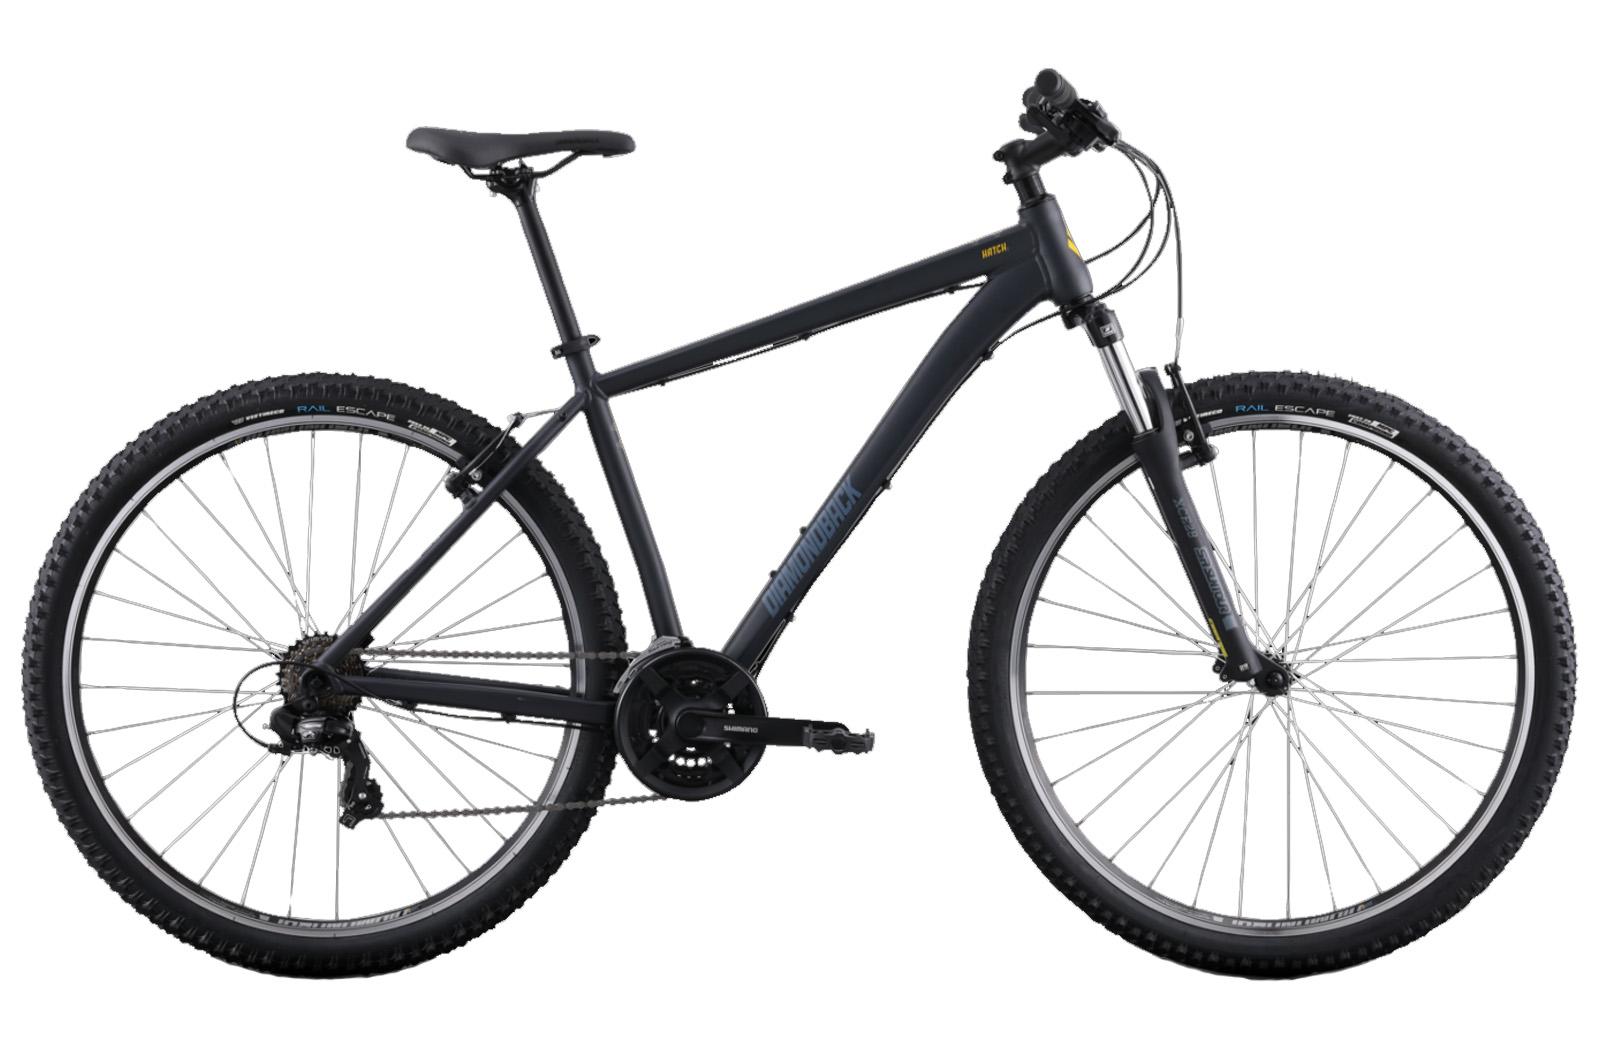 Nu verkrijgbaar: Diamondback Hatch 1 mountainbike & SILCA HX-One Toolkit